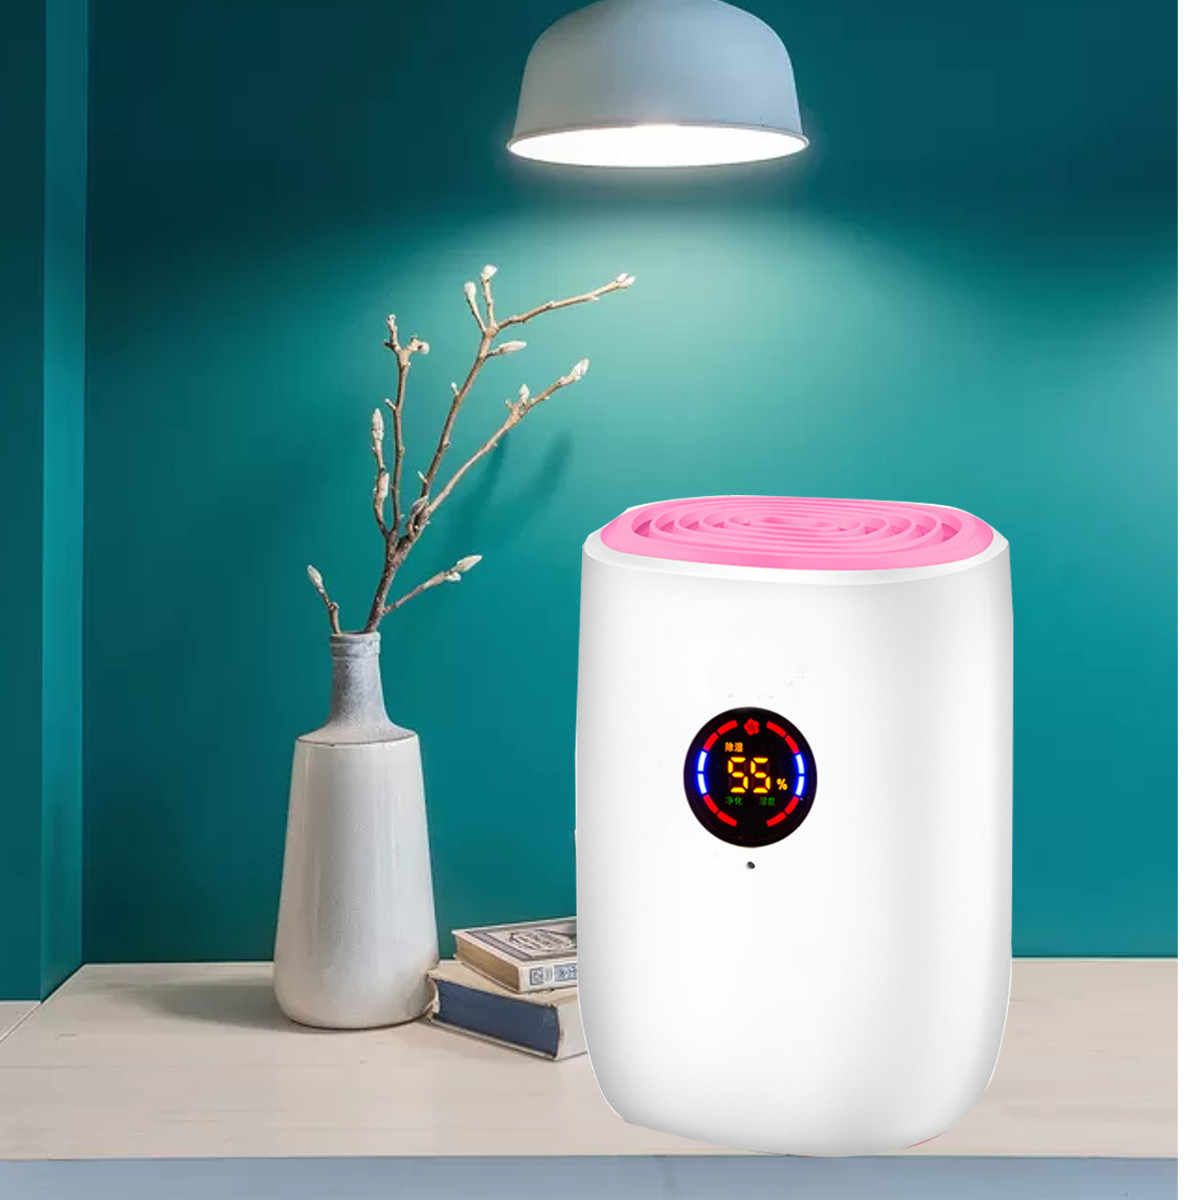 800ml חשמלי מיני נייד אוויר מסיר לחות בבית LED תצוגת חשמלי חדר מסיר לחות מטהר מכונה 100-240V